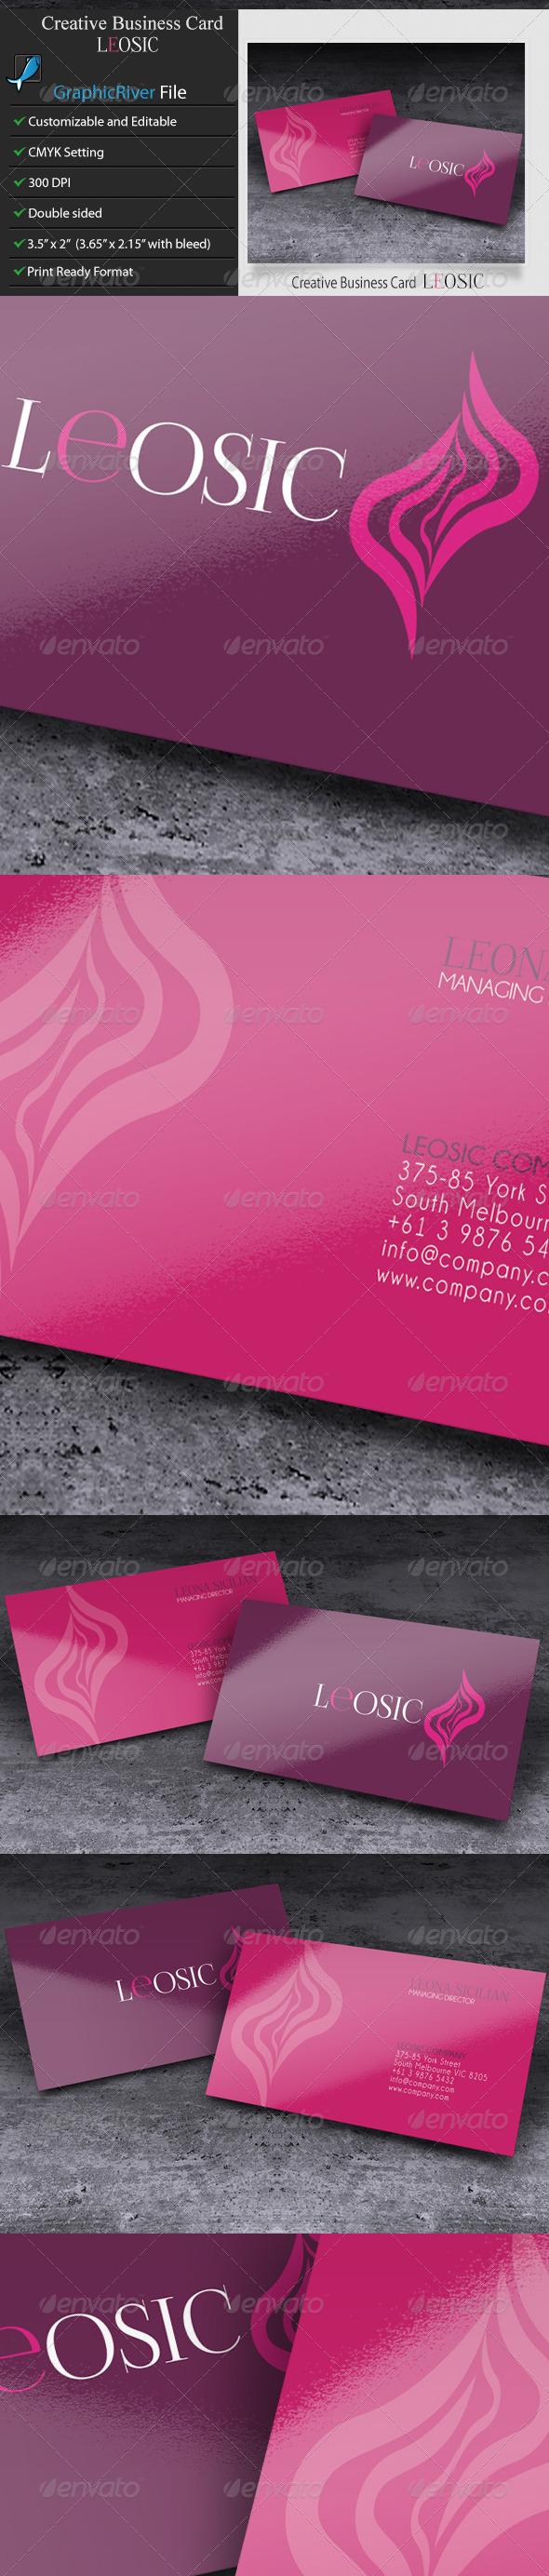 GraphicRiver Creative Business Card LEOSIC 5958639